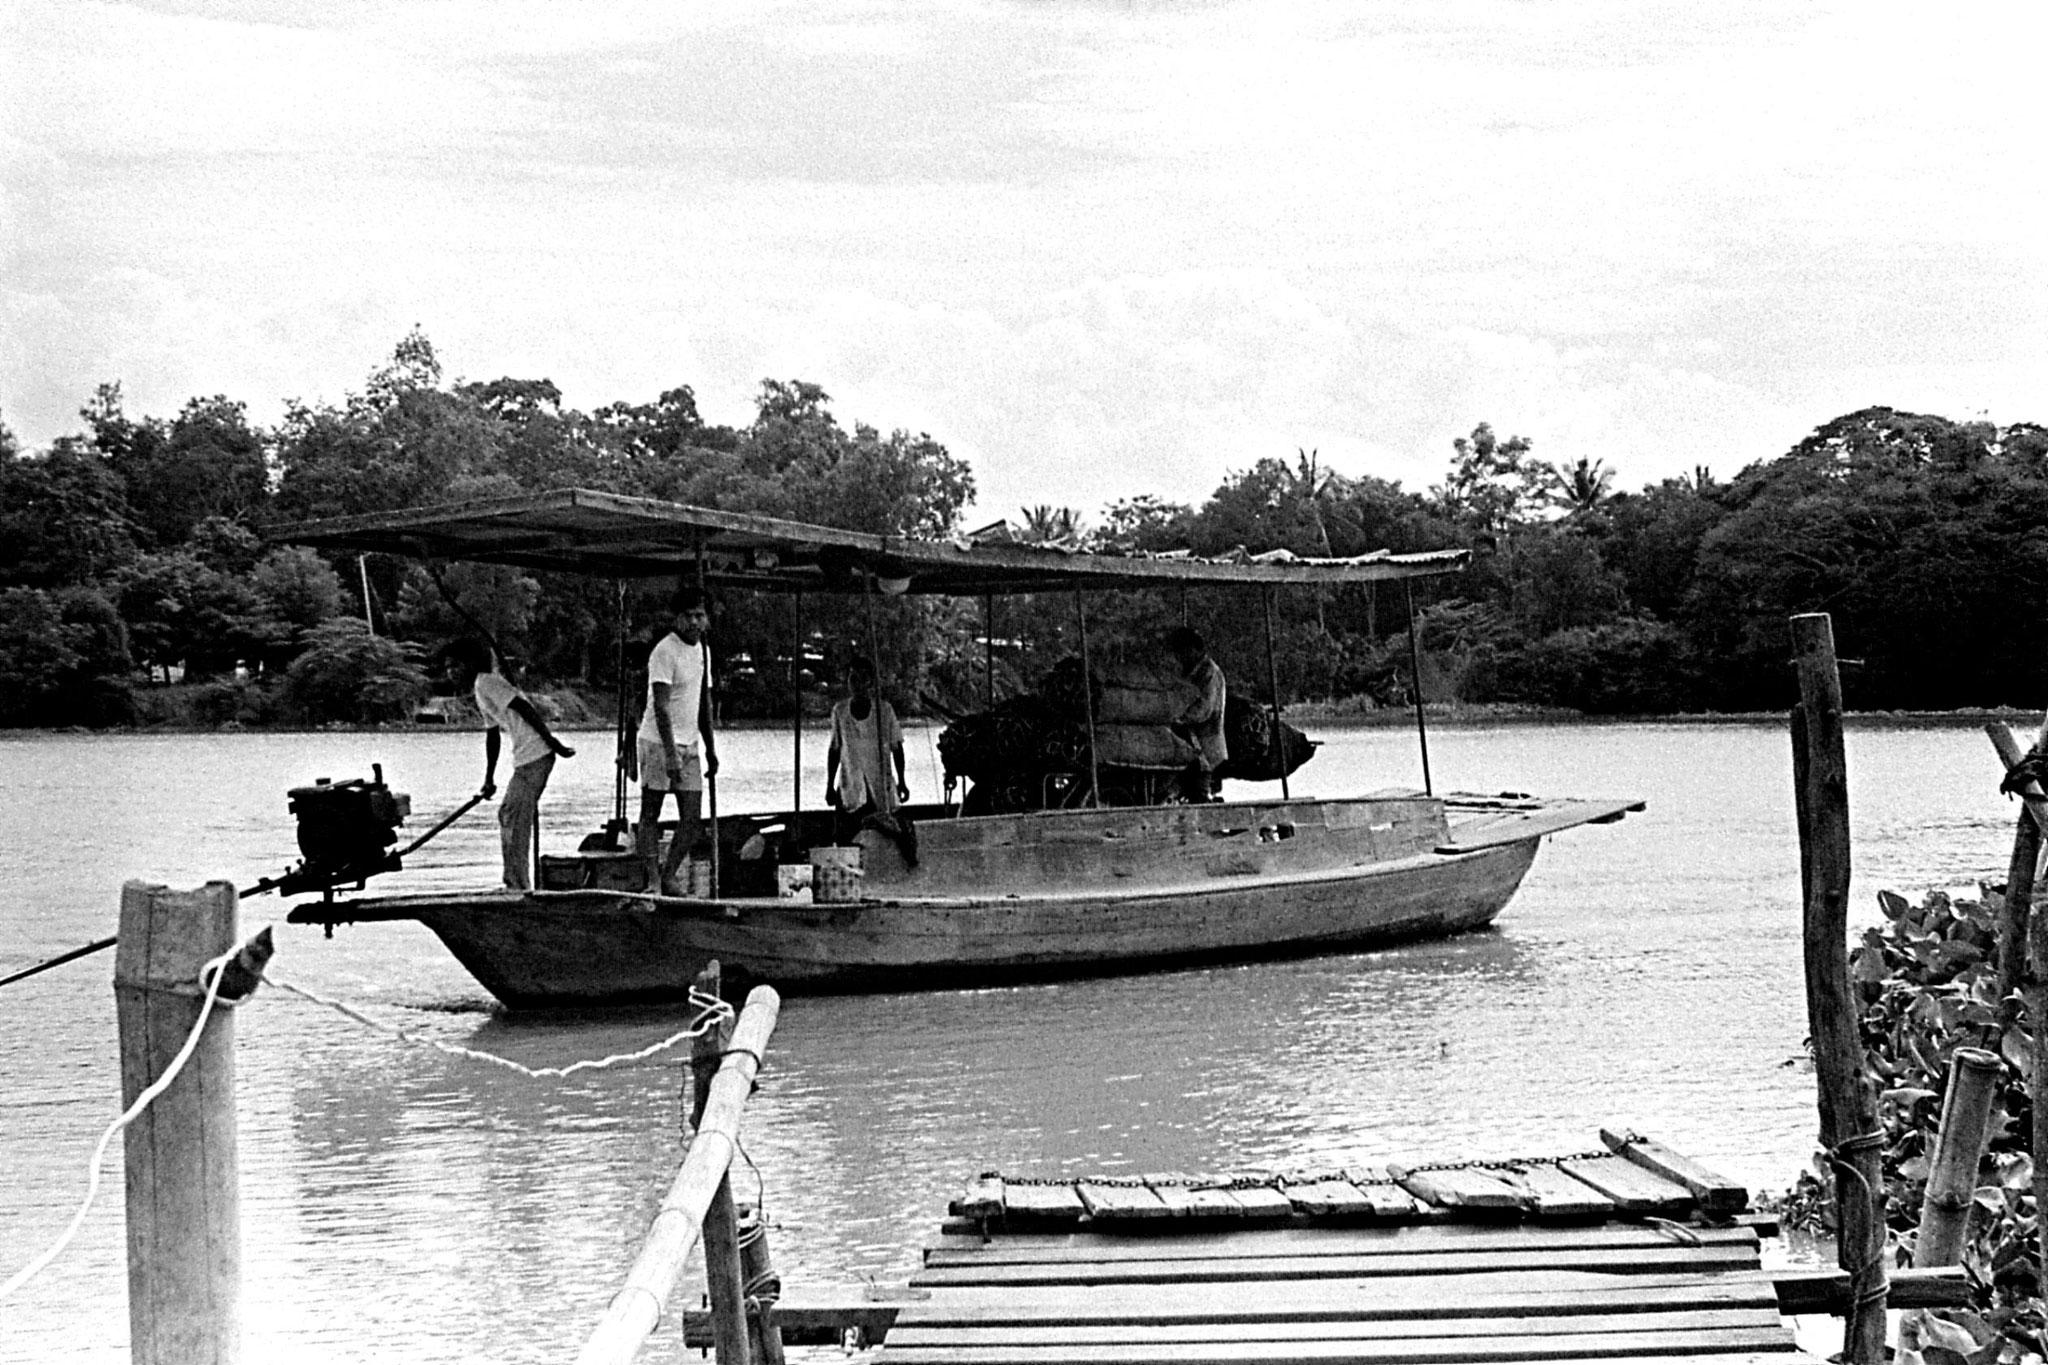 7/6/1990: 3: Manorom, ferry